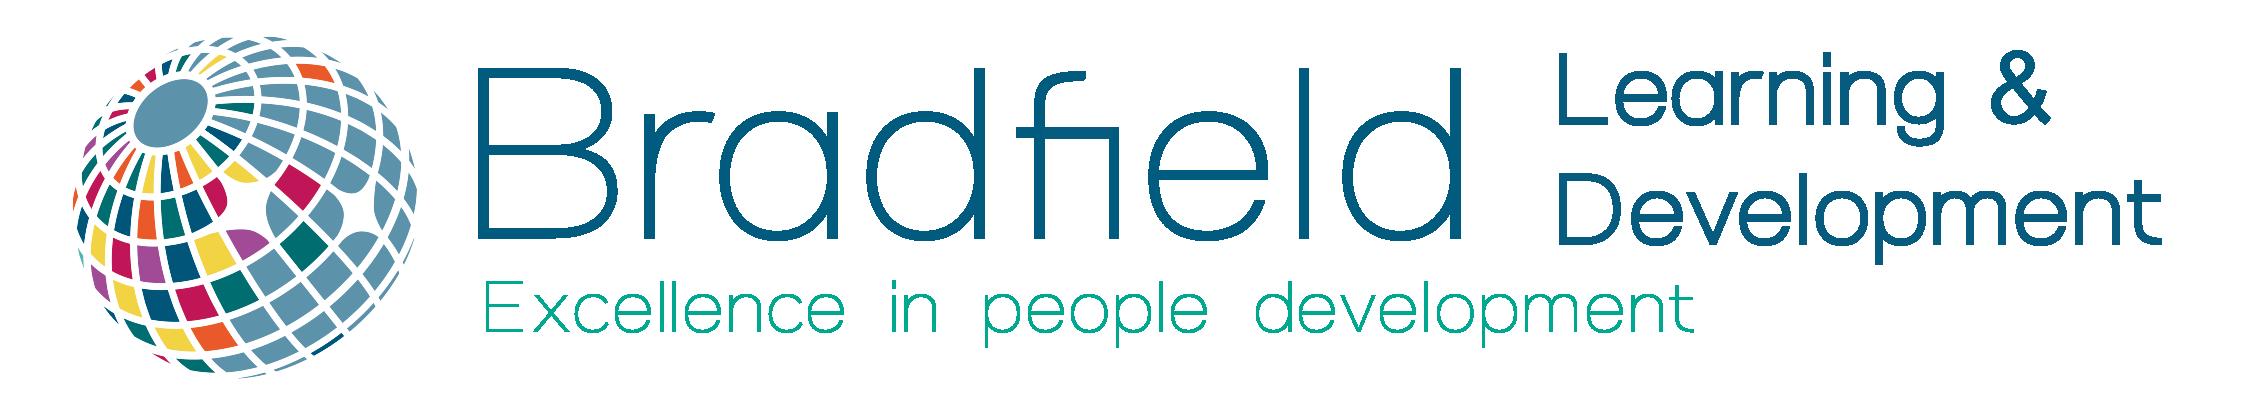 bradfield logo - Capytech